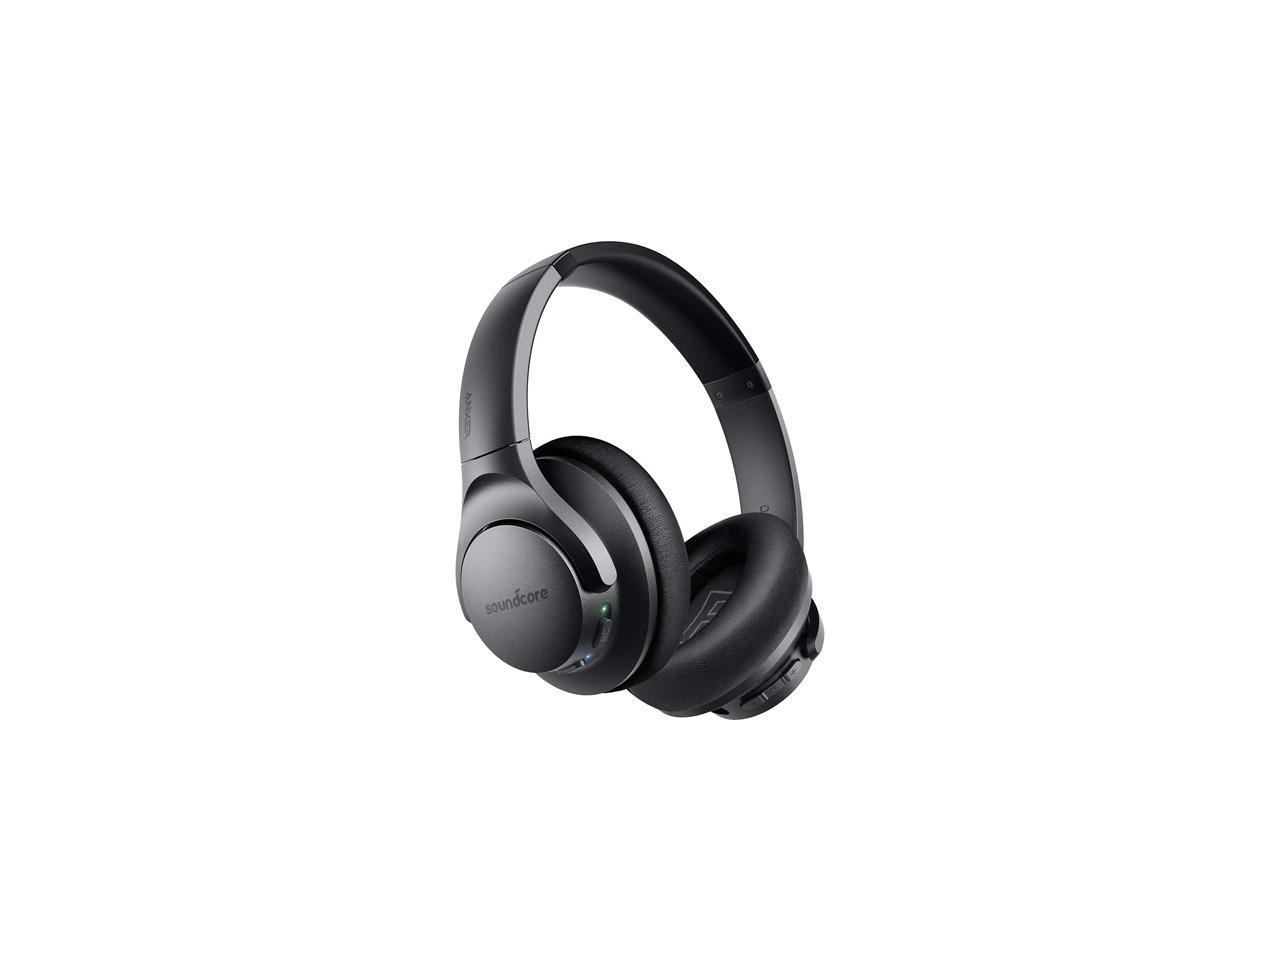 Anker Soundcore Life Q20 Hybrid Active Noise Cancelling Headphones @Newegg $40